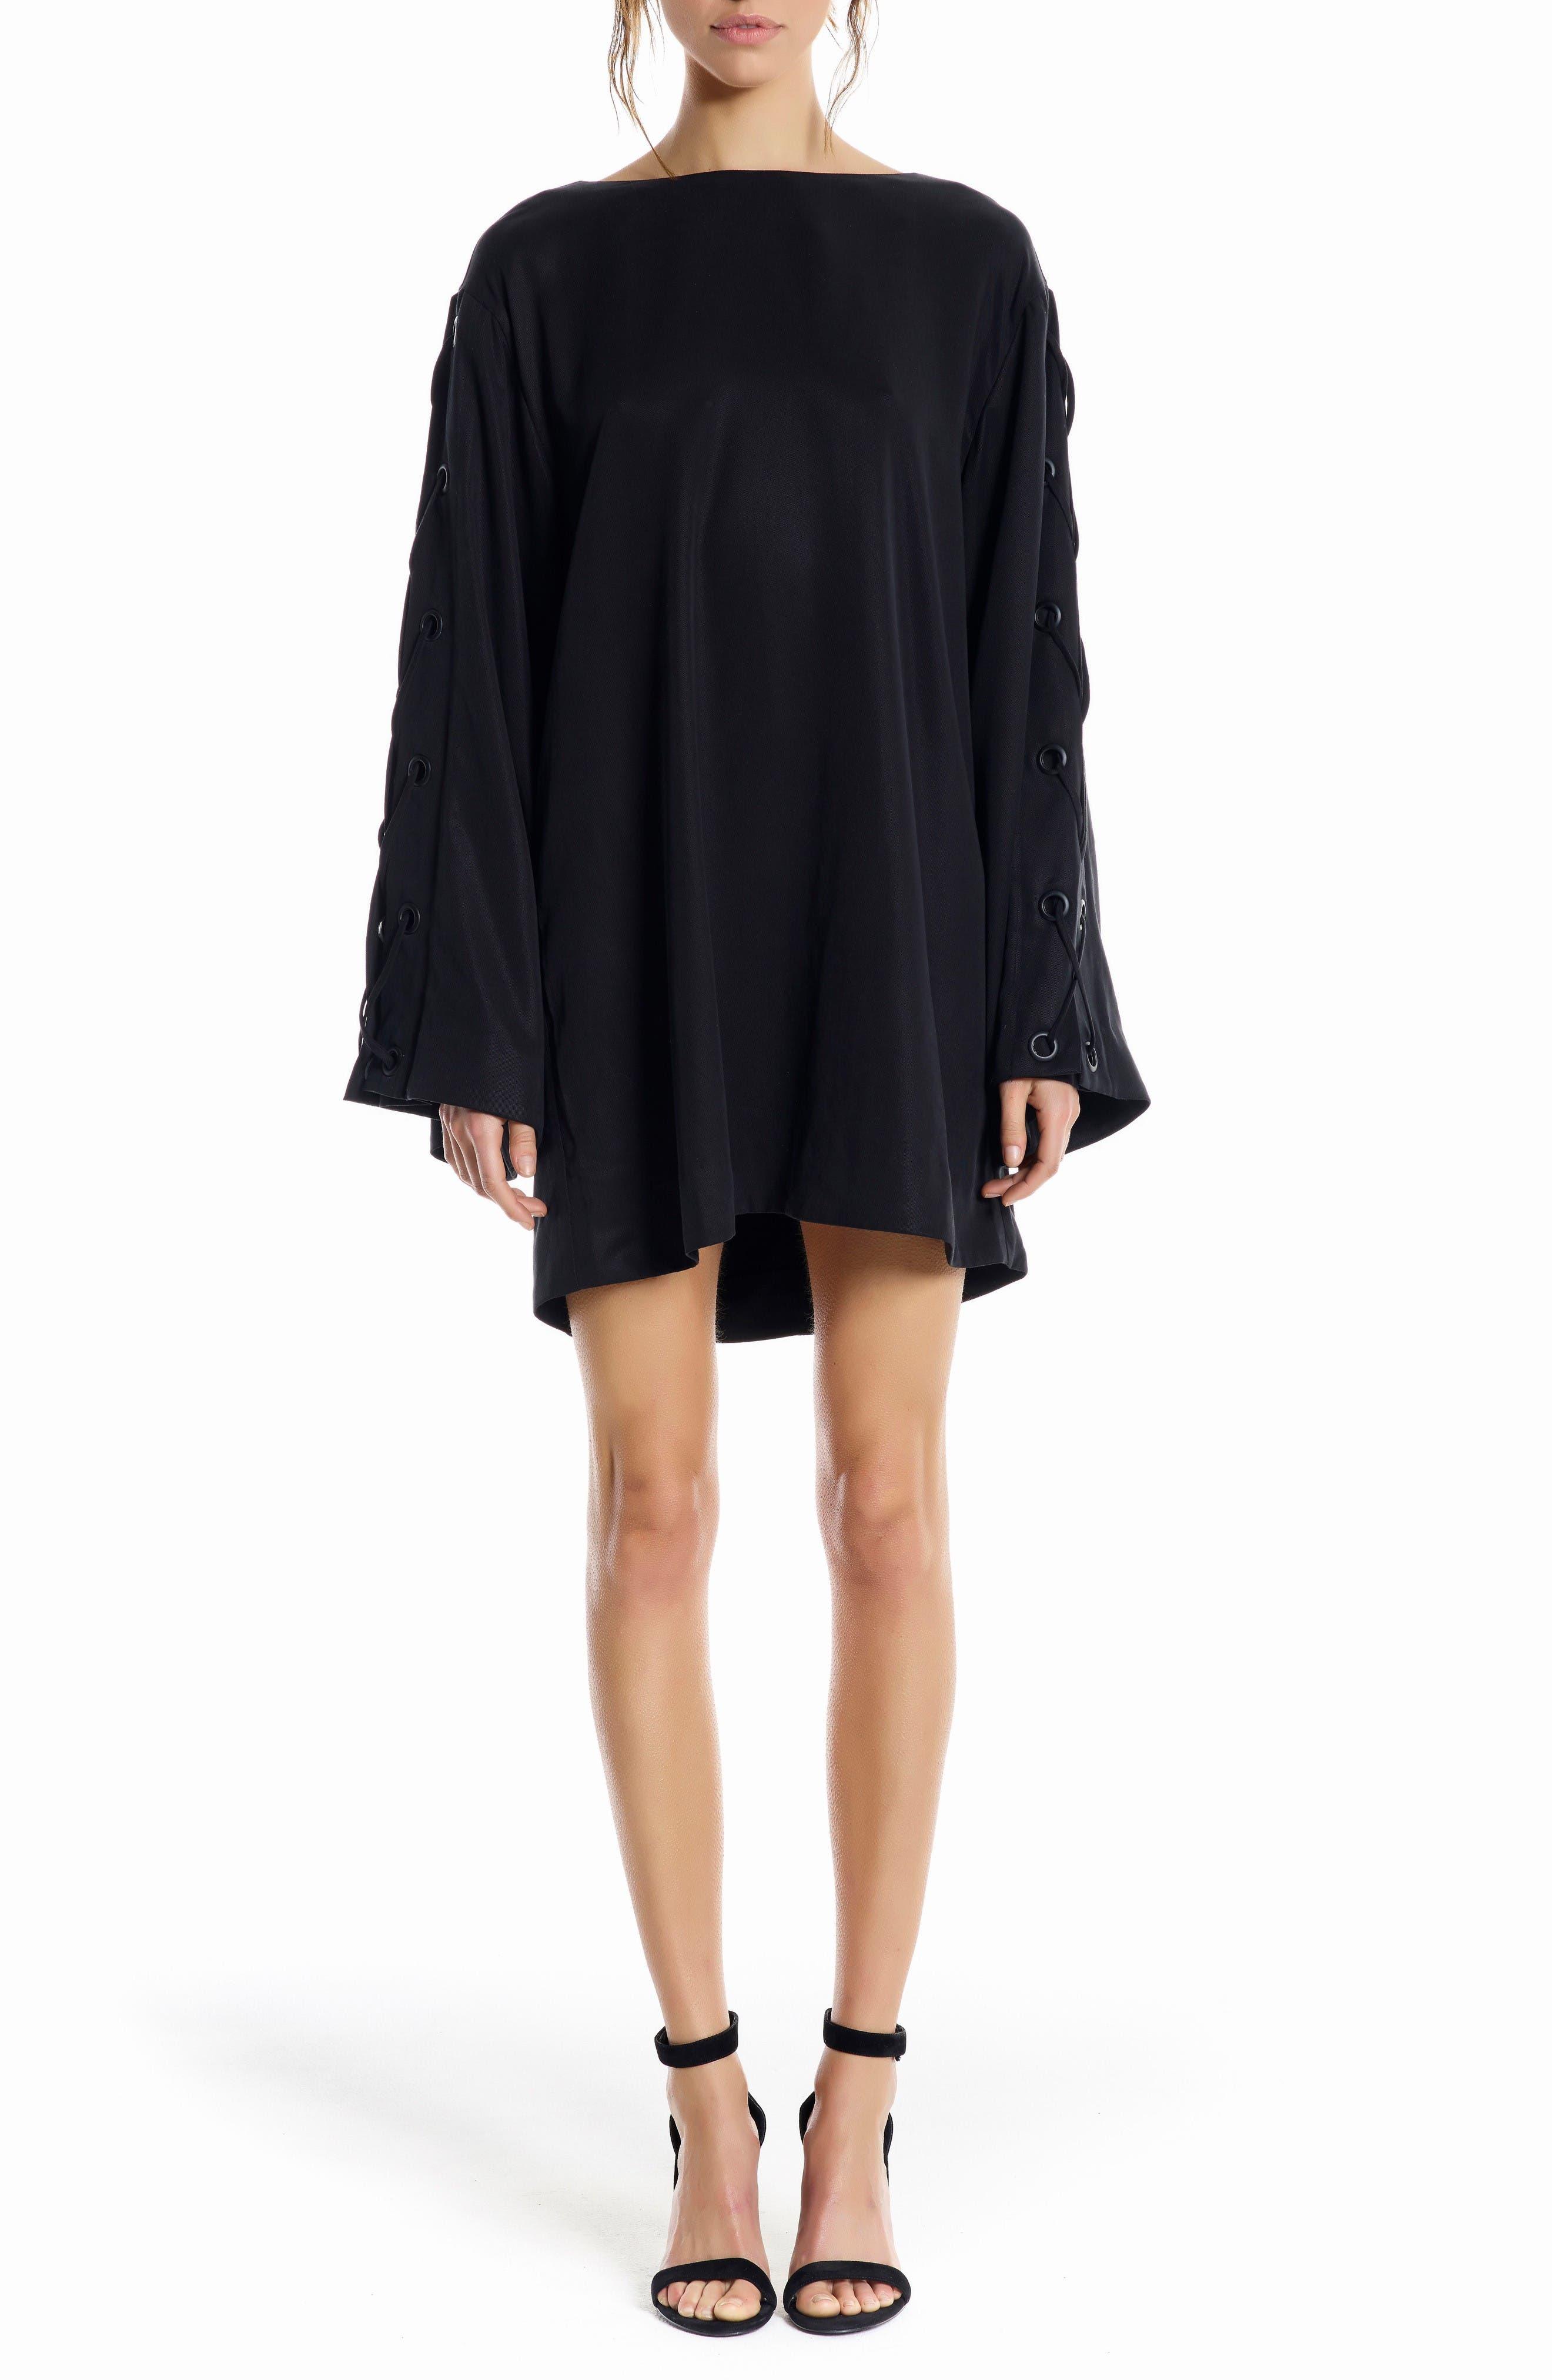 KENDALL + KYLIE Bell Sleeve Minidress